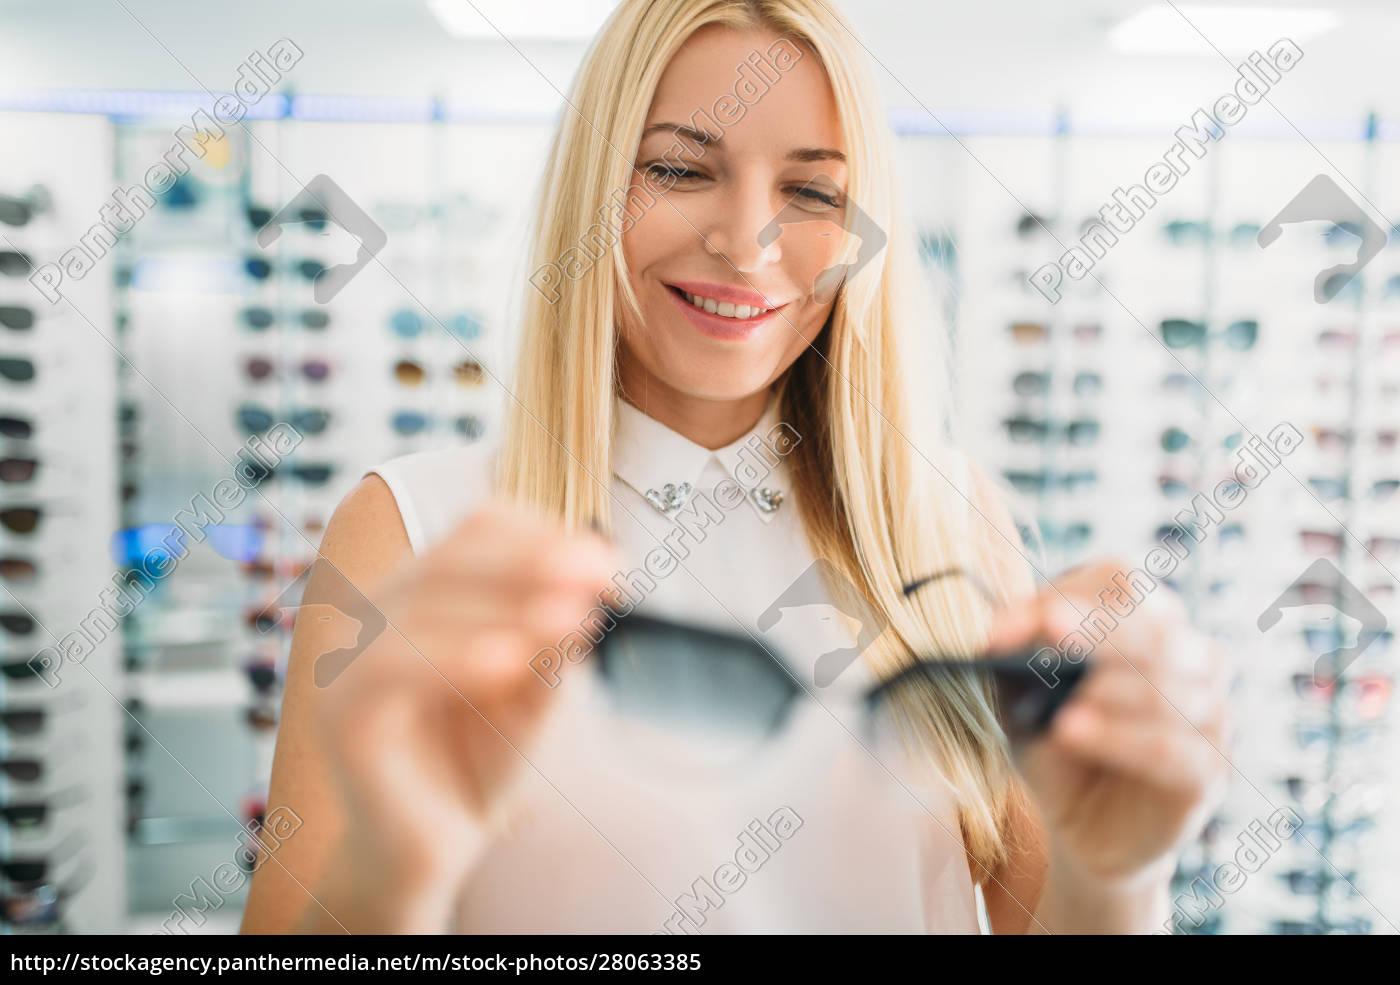 female, optician, shows, sunglasses, in, optics - 28063385